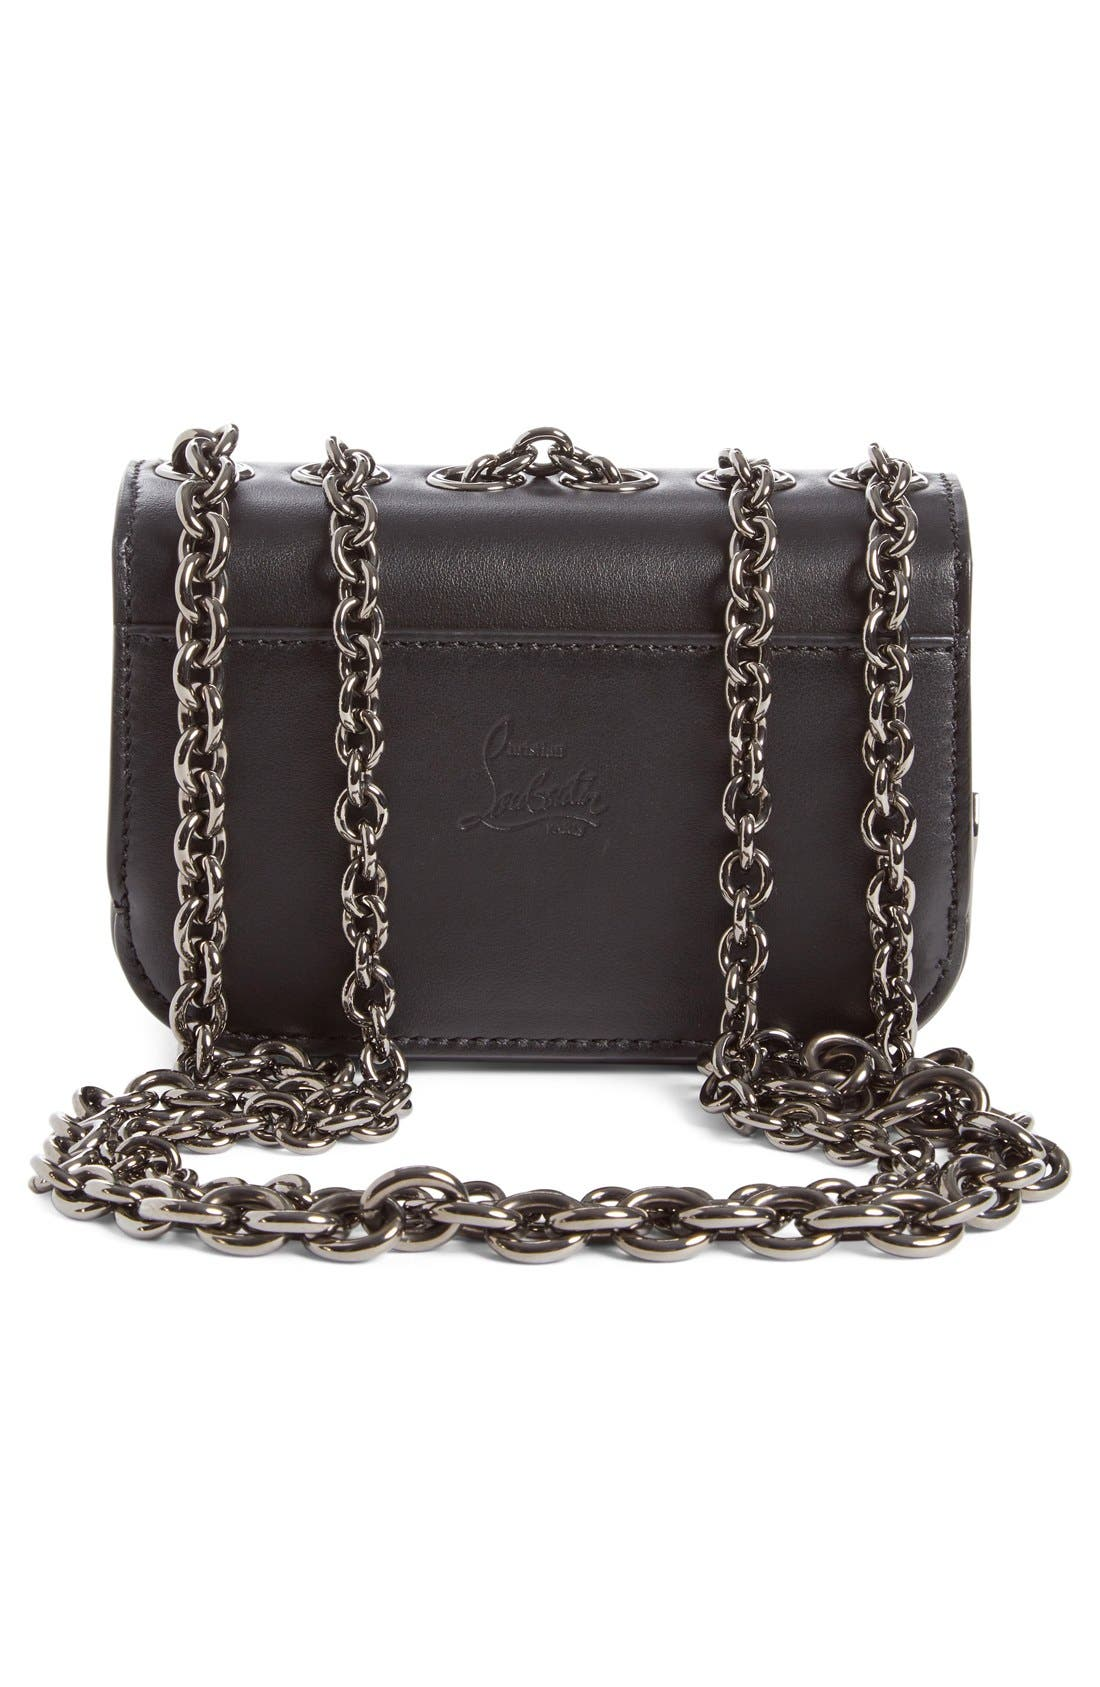 'Mini Sweet Charity' Spiked Calfskin Shoulder/Crossbody Bag,                             Alternate thumbnail 5, color,                             003